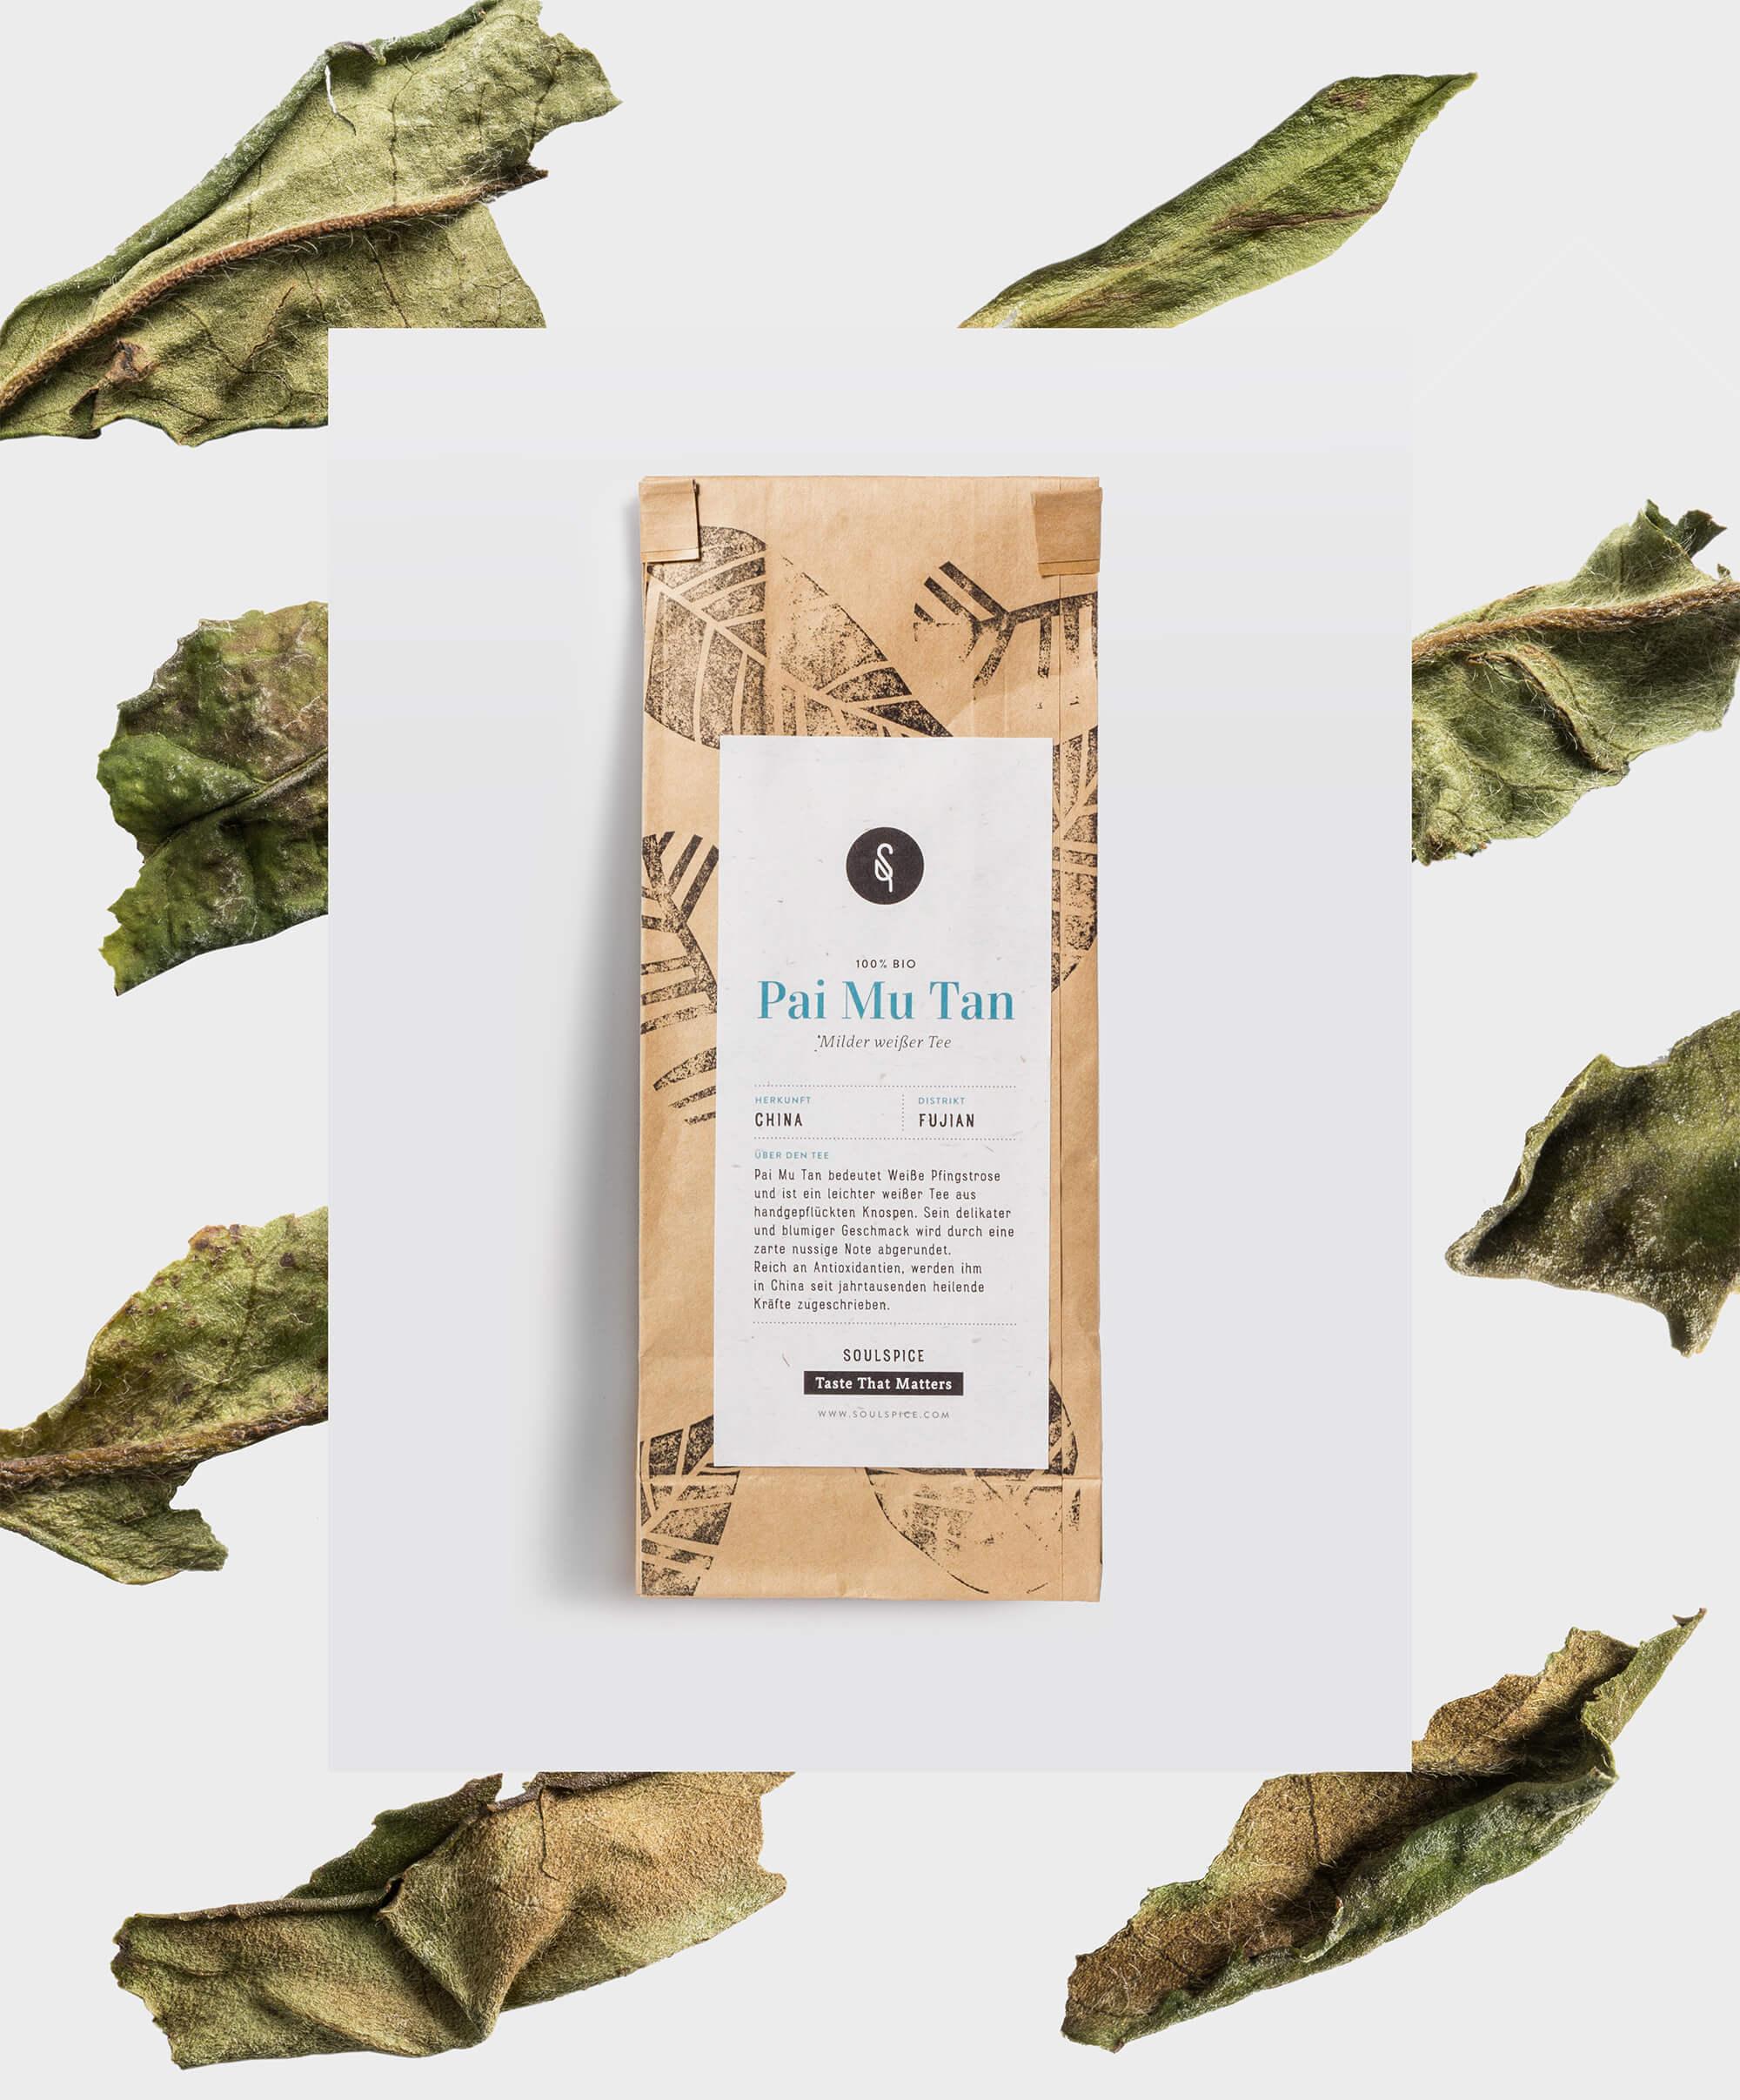 Packaging des Pai Mu Tan Tees